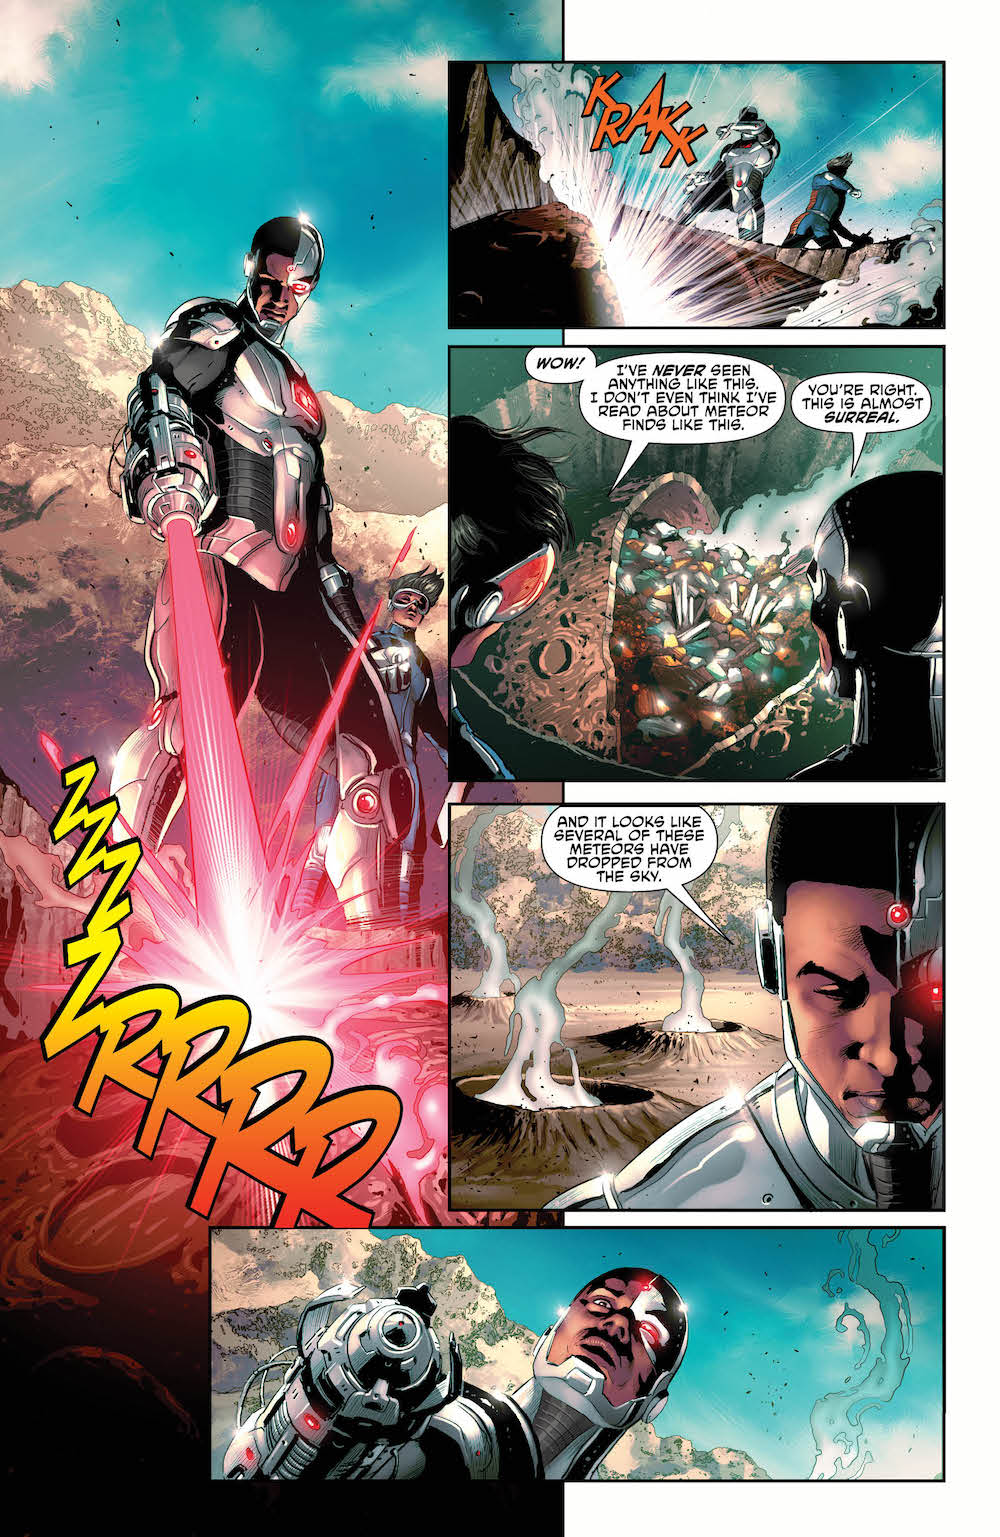 Cyborg #19, Grevioux arc